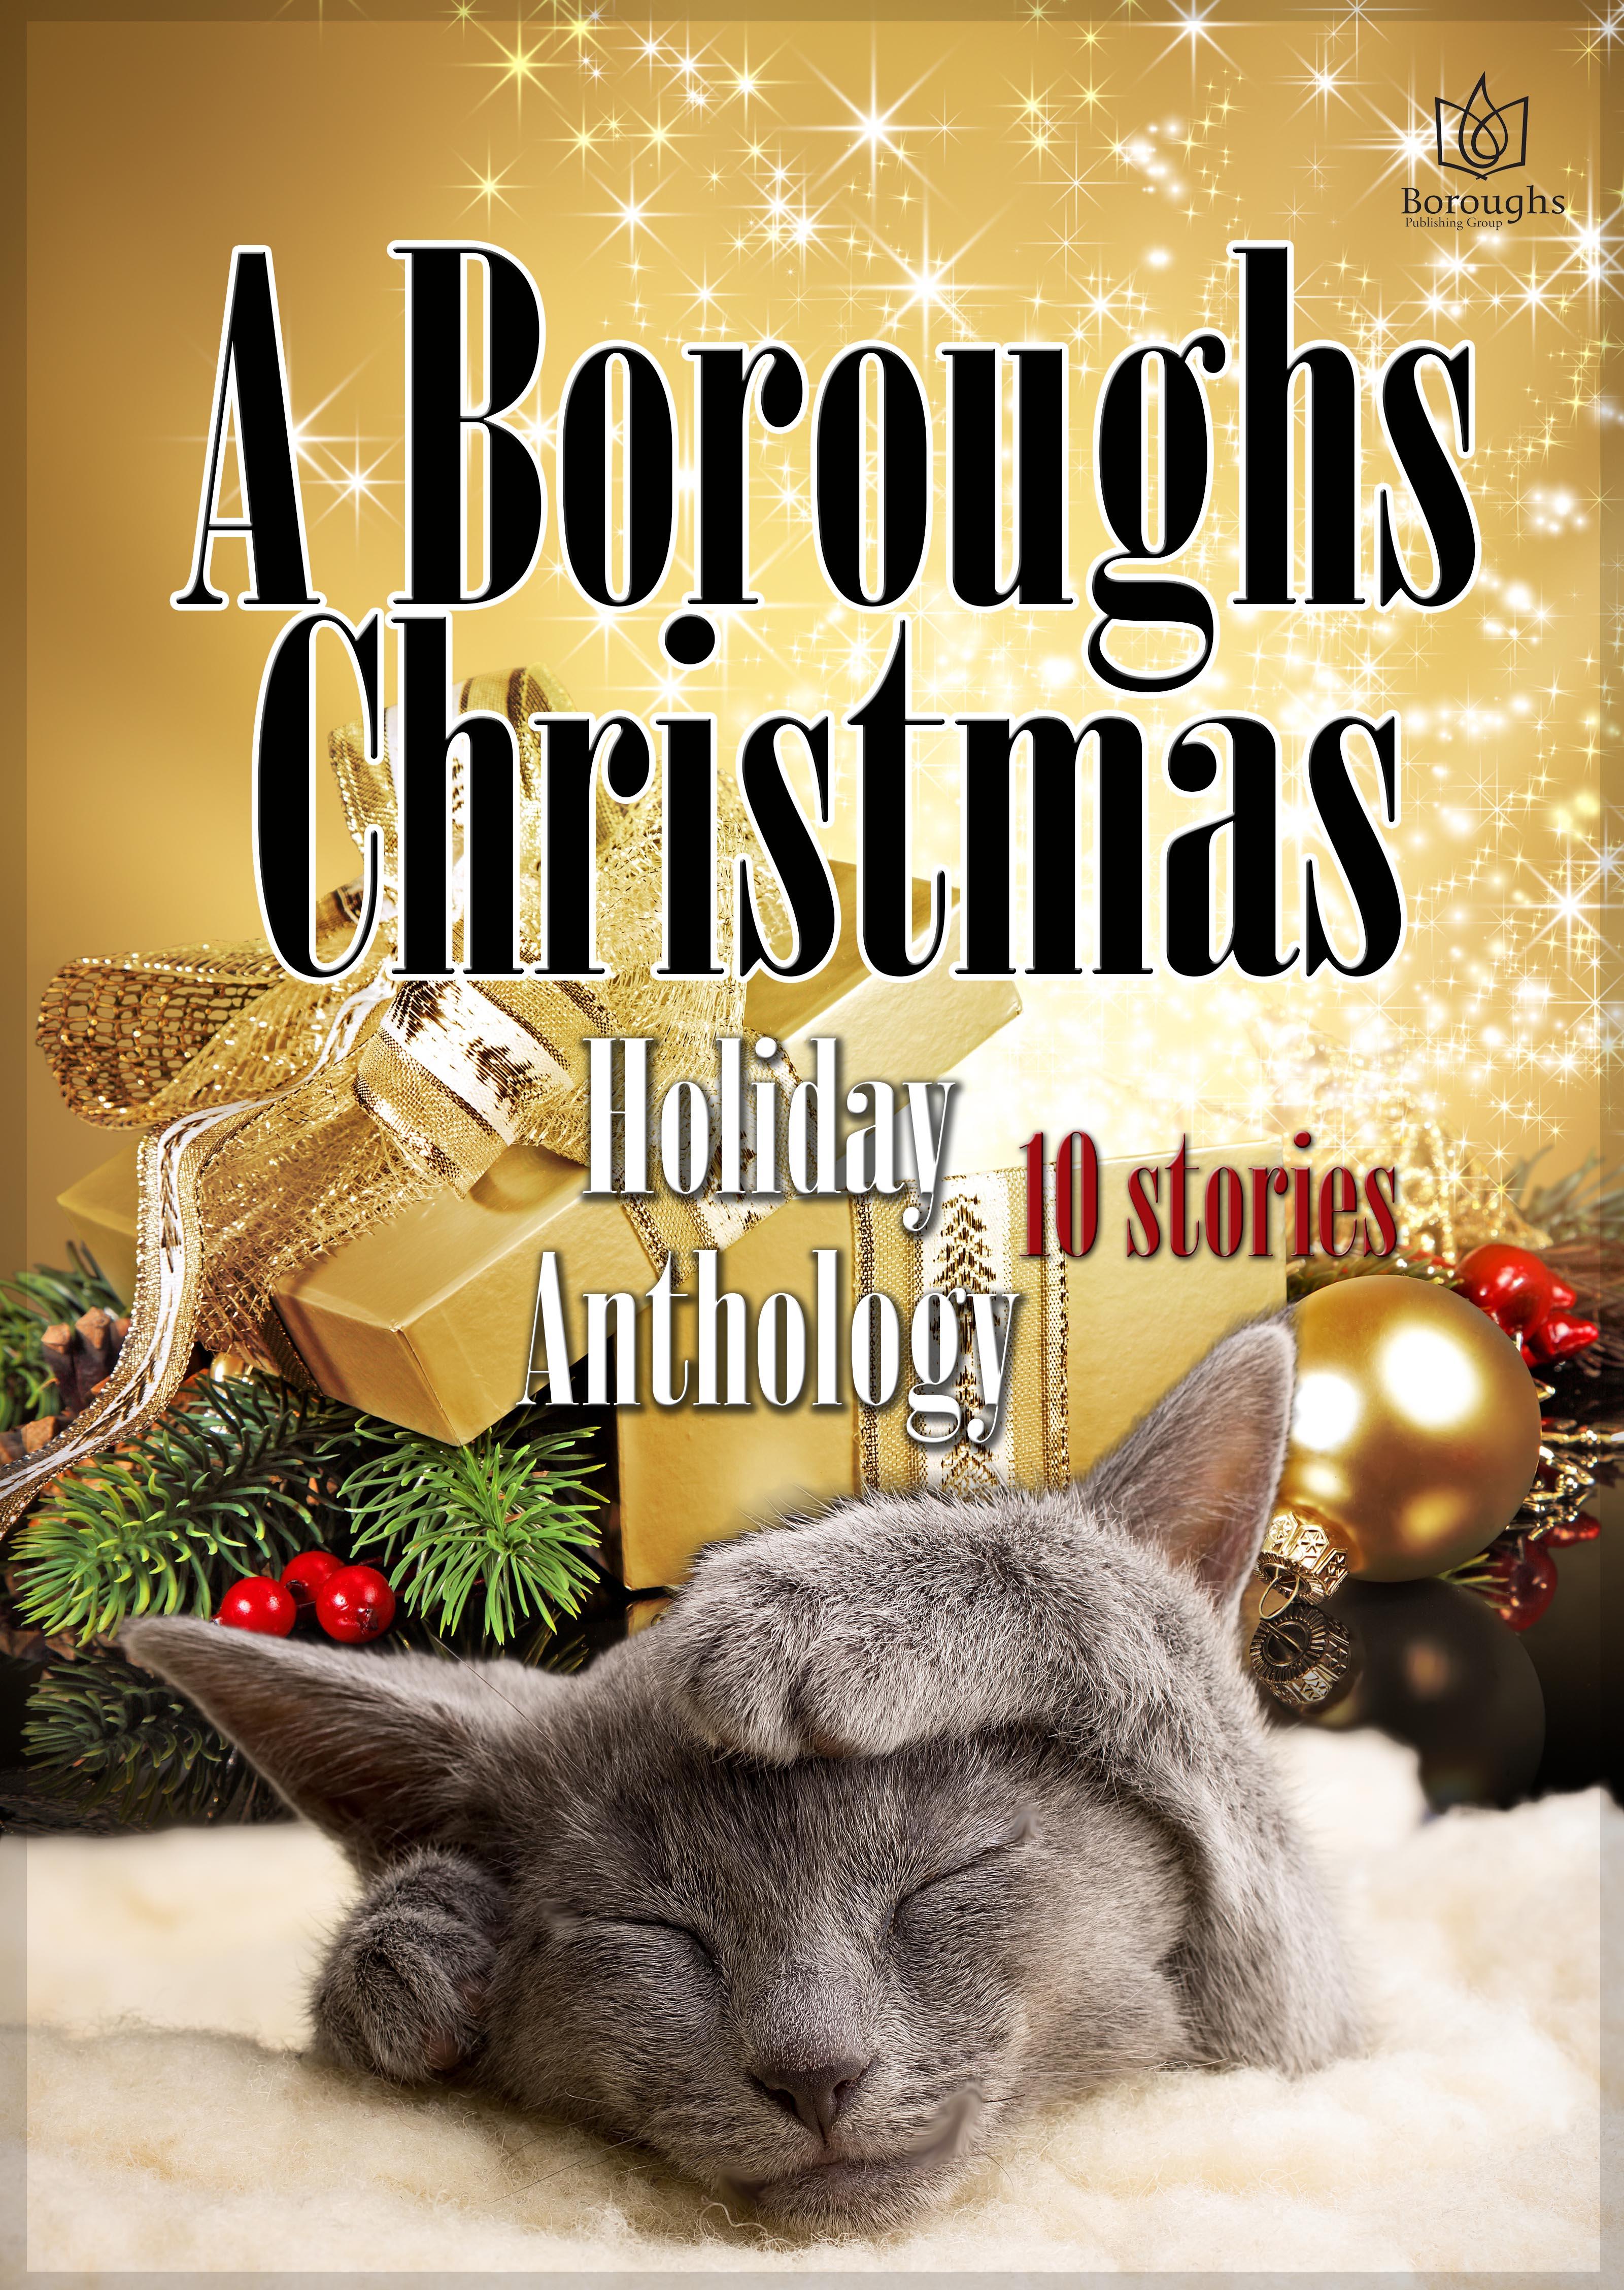 Kellyann Zuzulo - A Boroughs Christmas Holiday Anthology